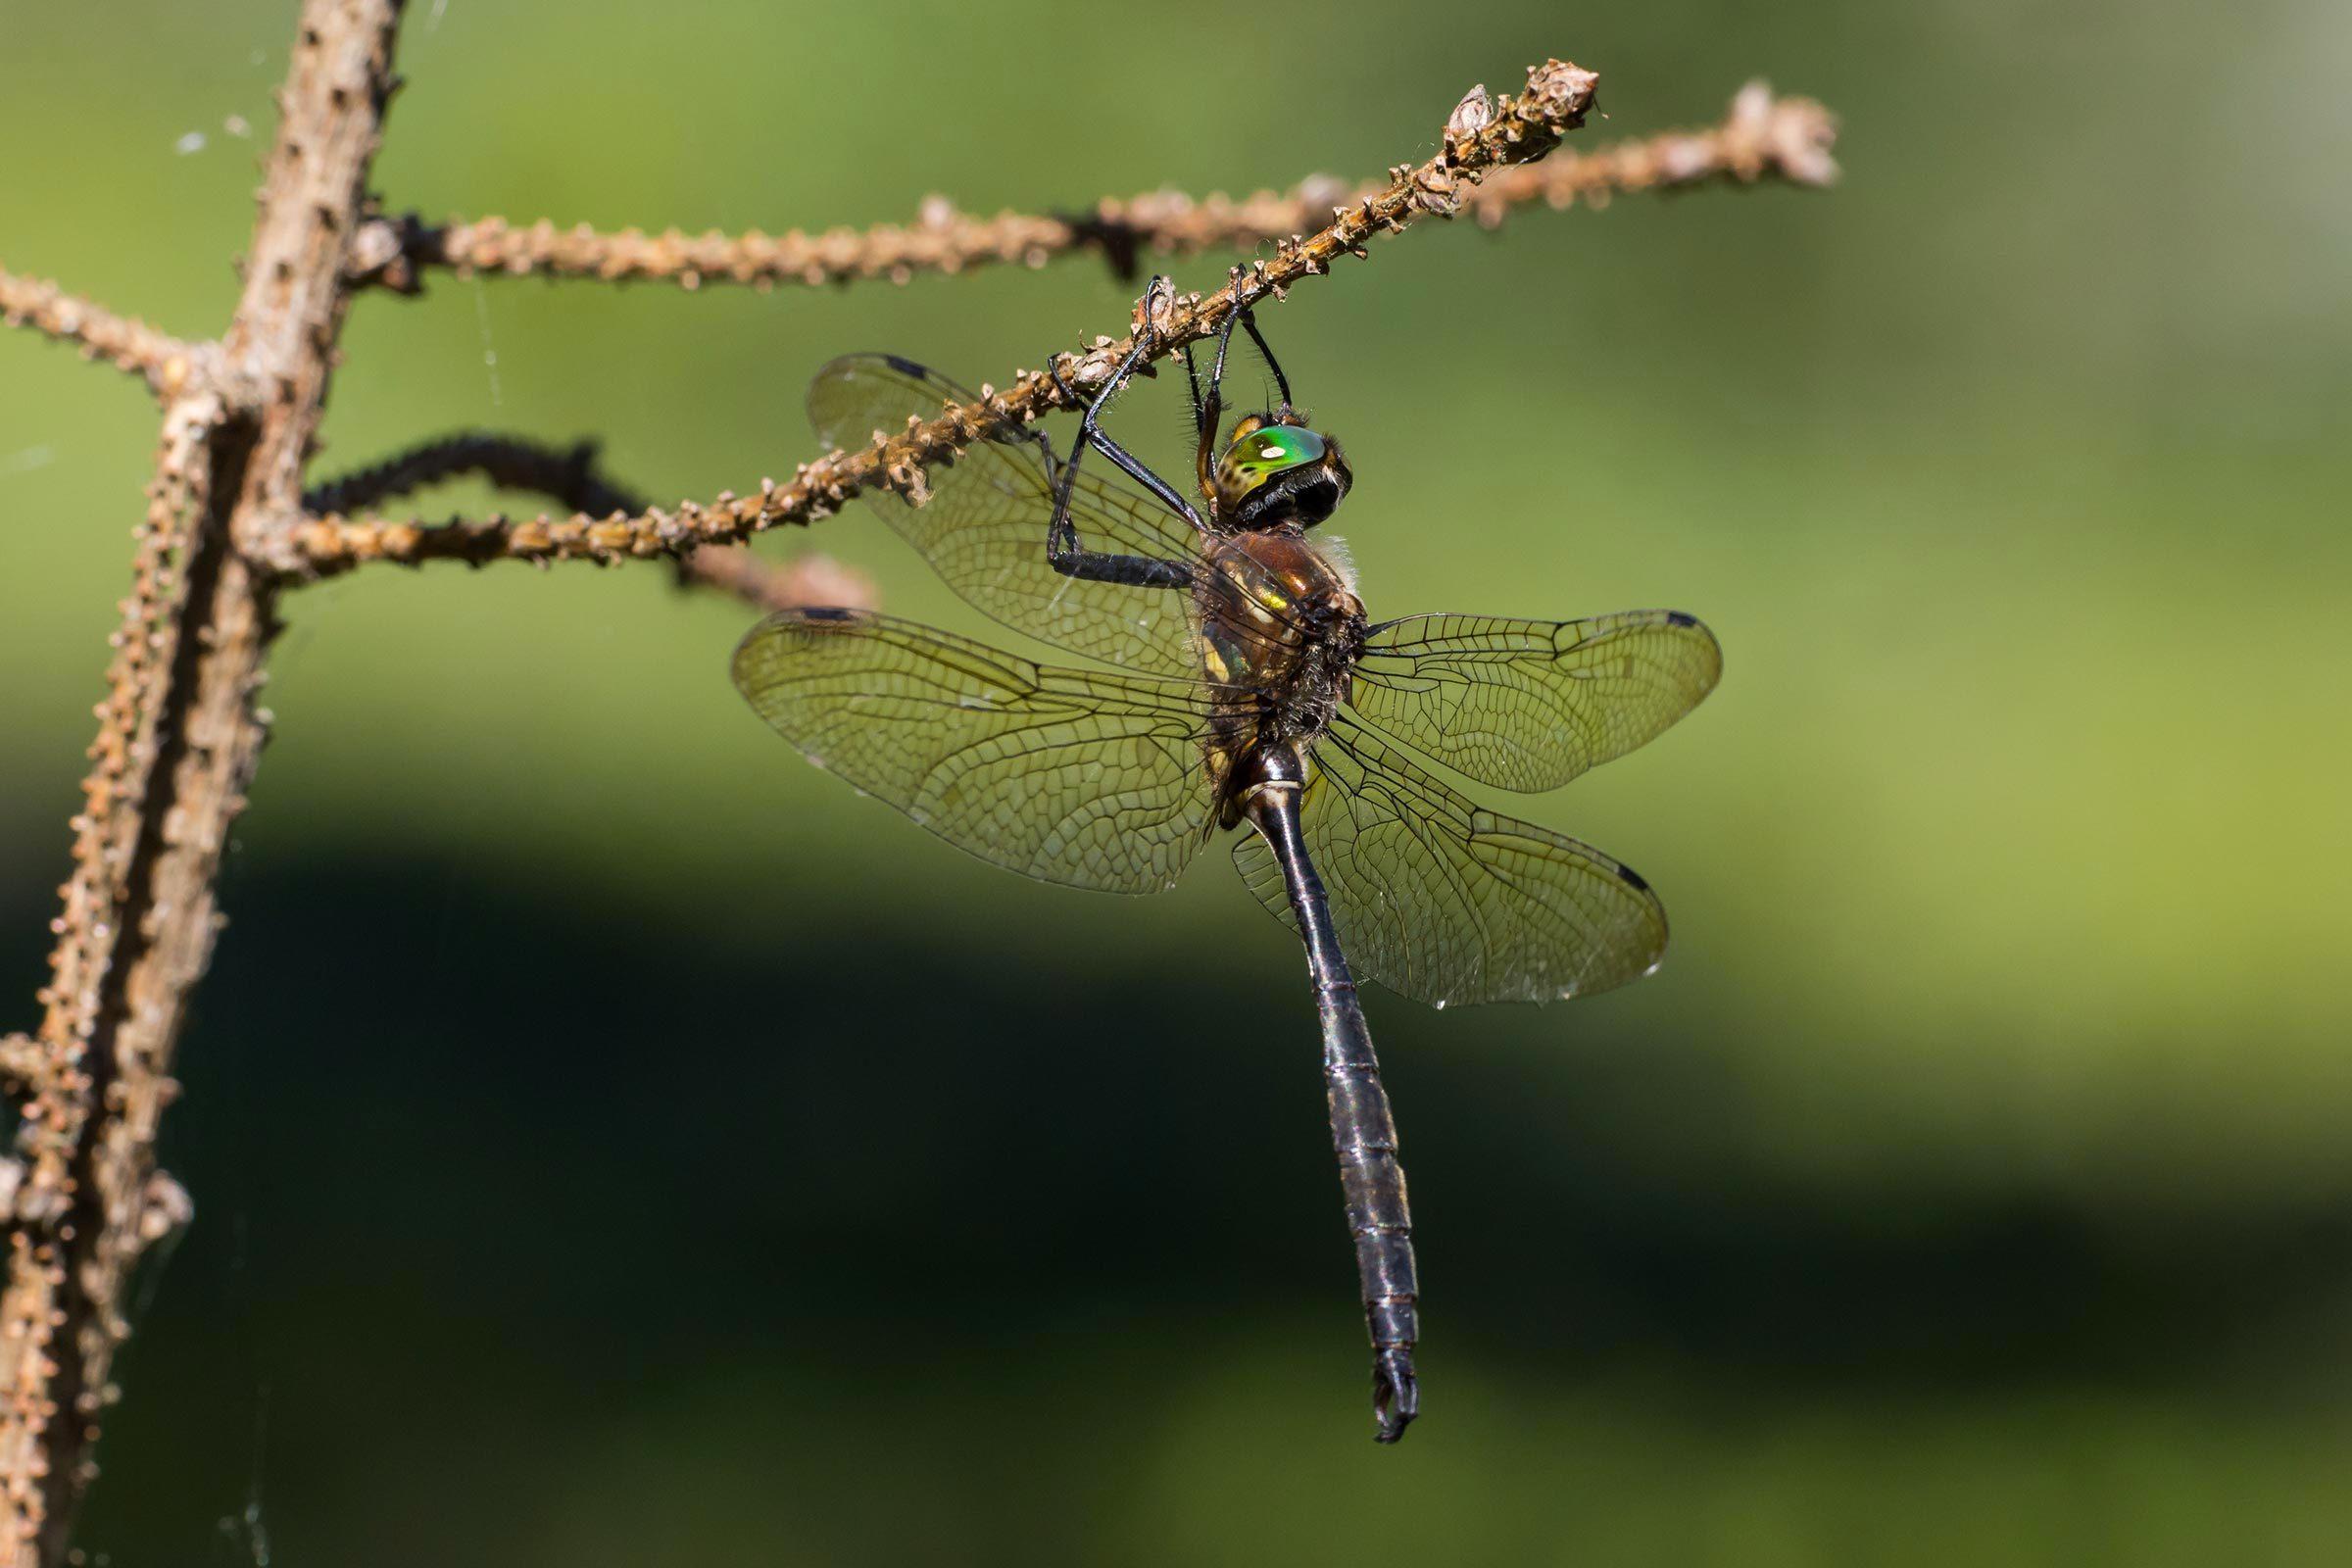 Espèces menacées : libellule émeraude de Hine (Somatochlora hineana)